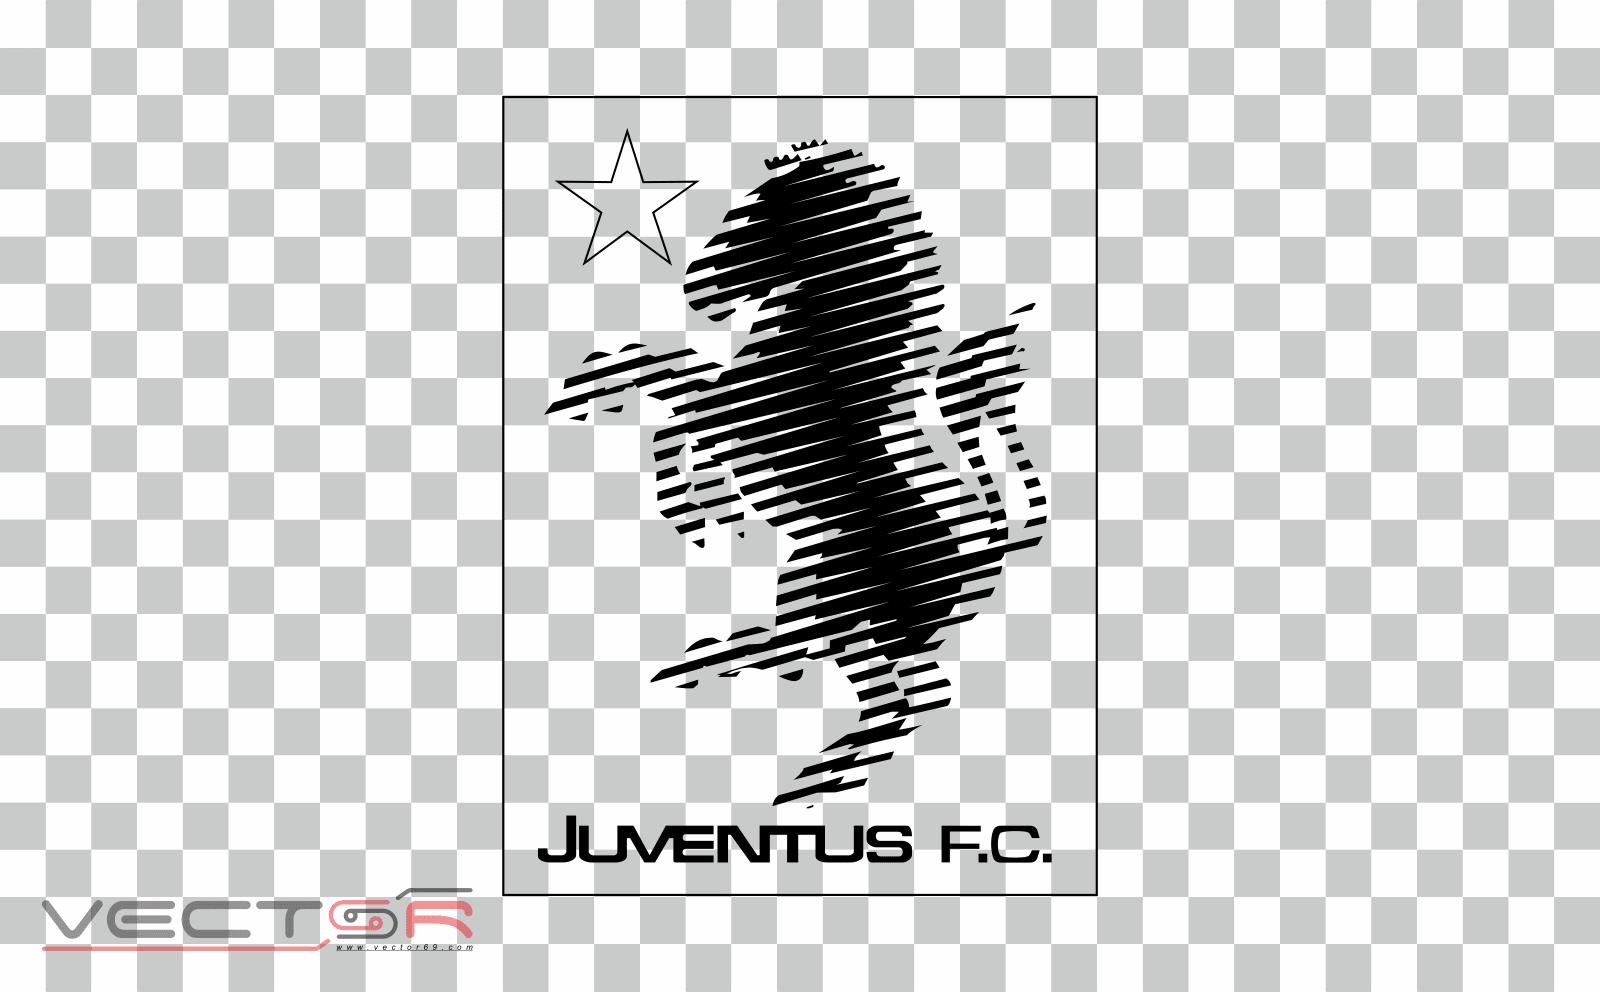 Juventus F.C. (1977) Logo - Download .PNG (Portable Network Graphics) Transparent Images